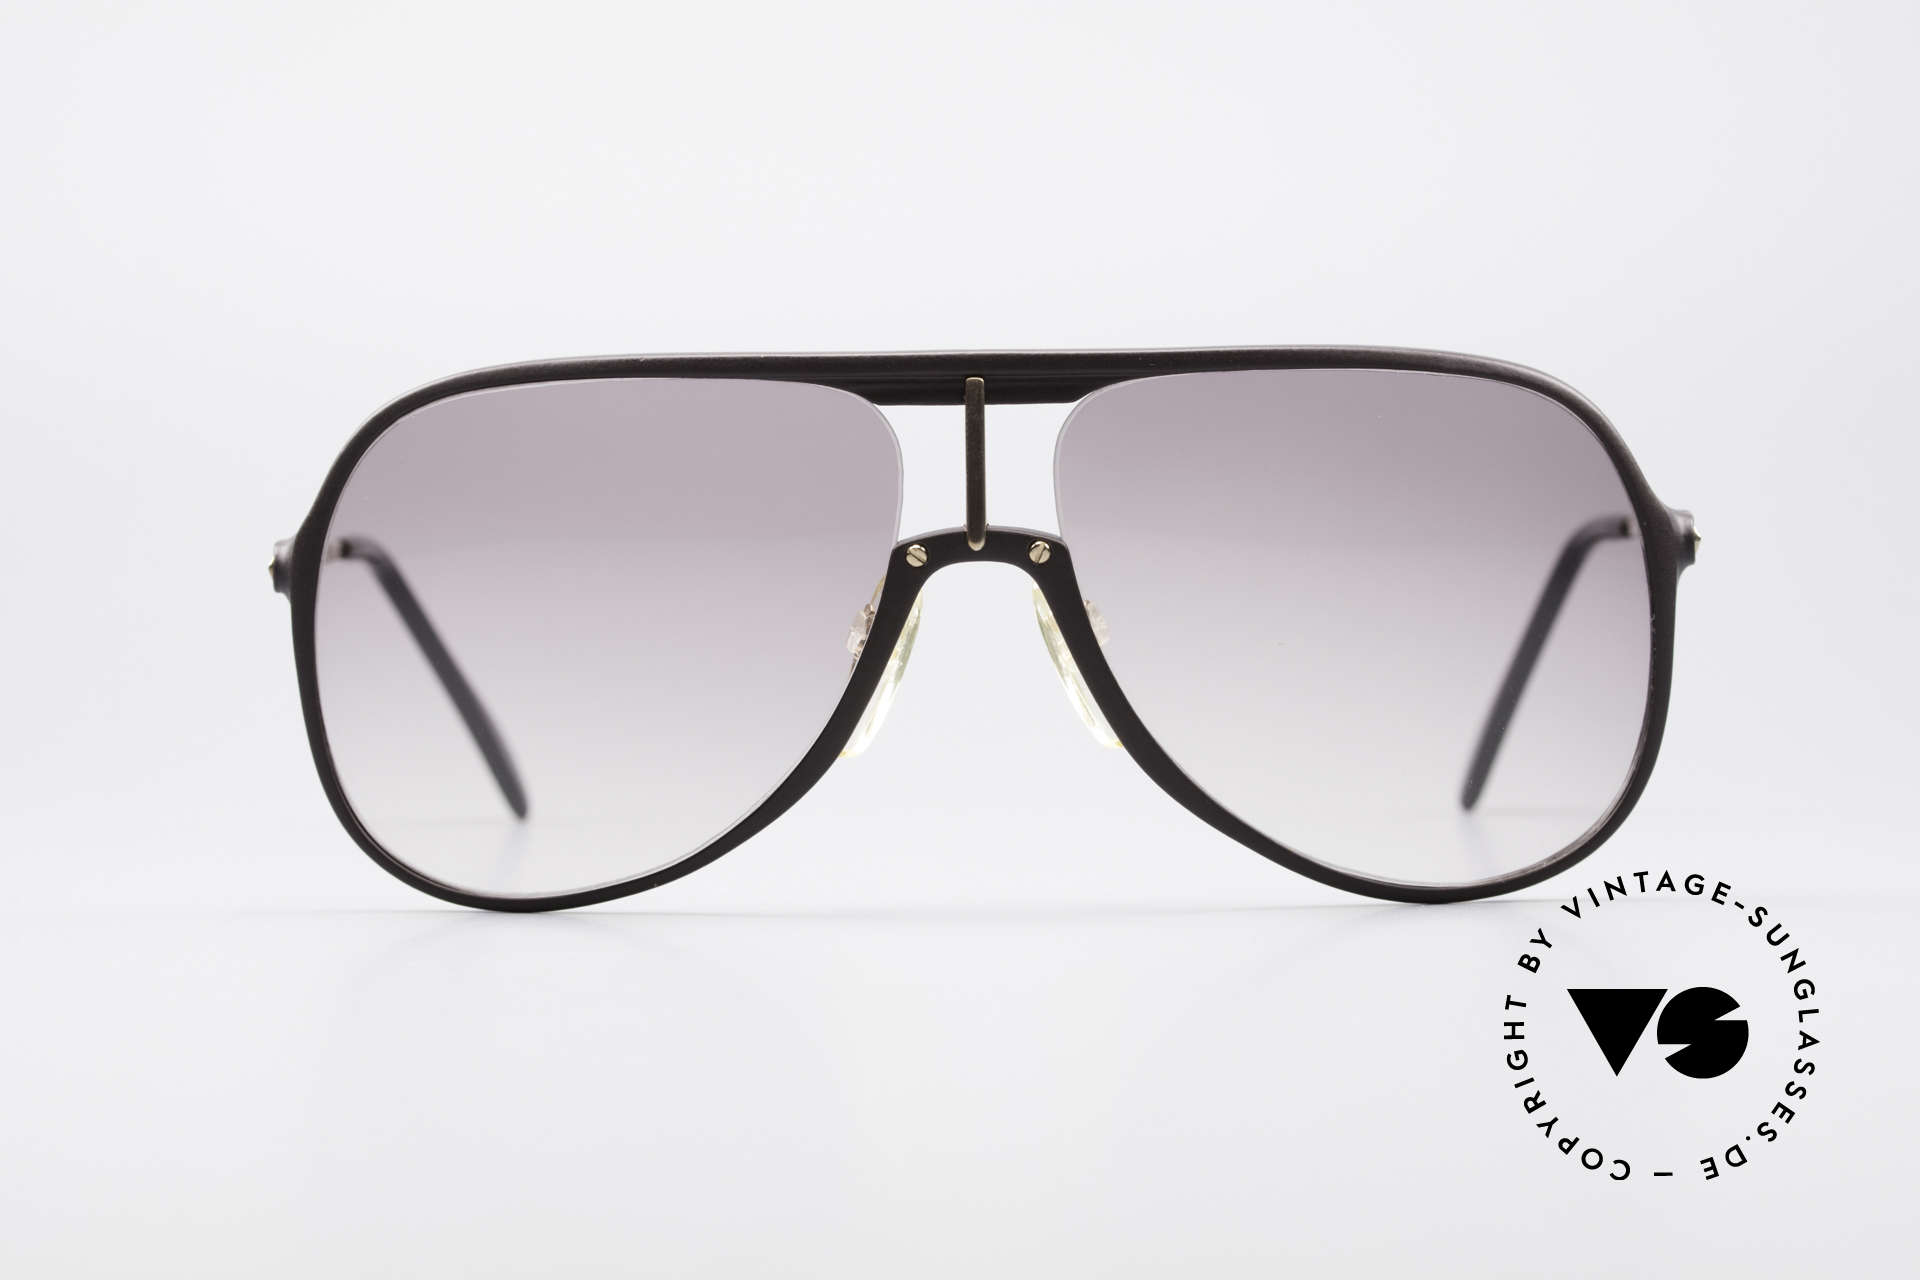 2b303bf6ba3af Sunglasses Menrad 727 80 s Quality Sunglasses